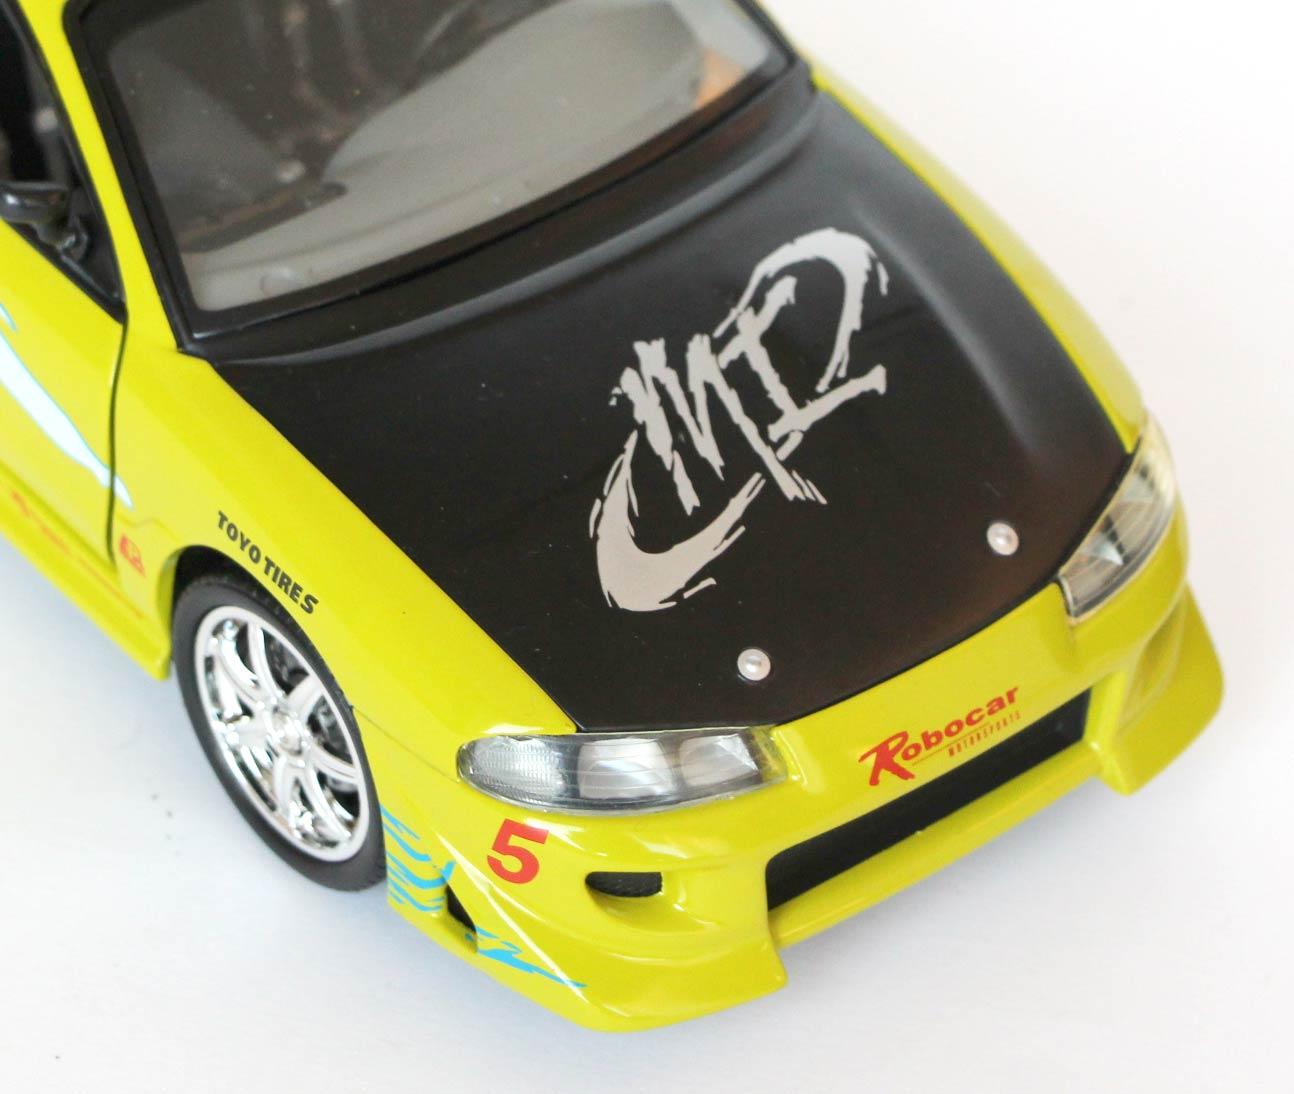 Capot de la Mitsubishi Eclipse Fast Furious - ech 1-18 Joyride